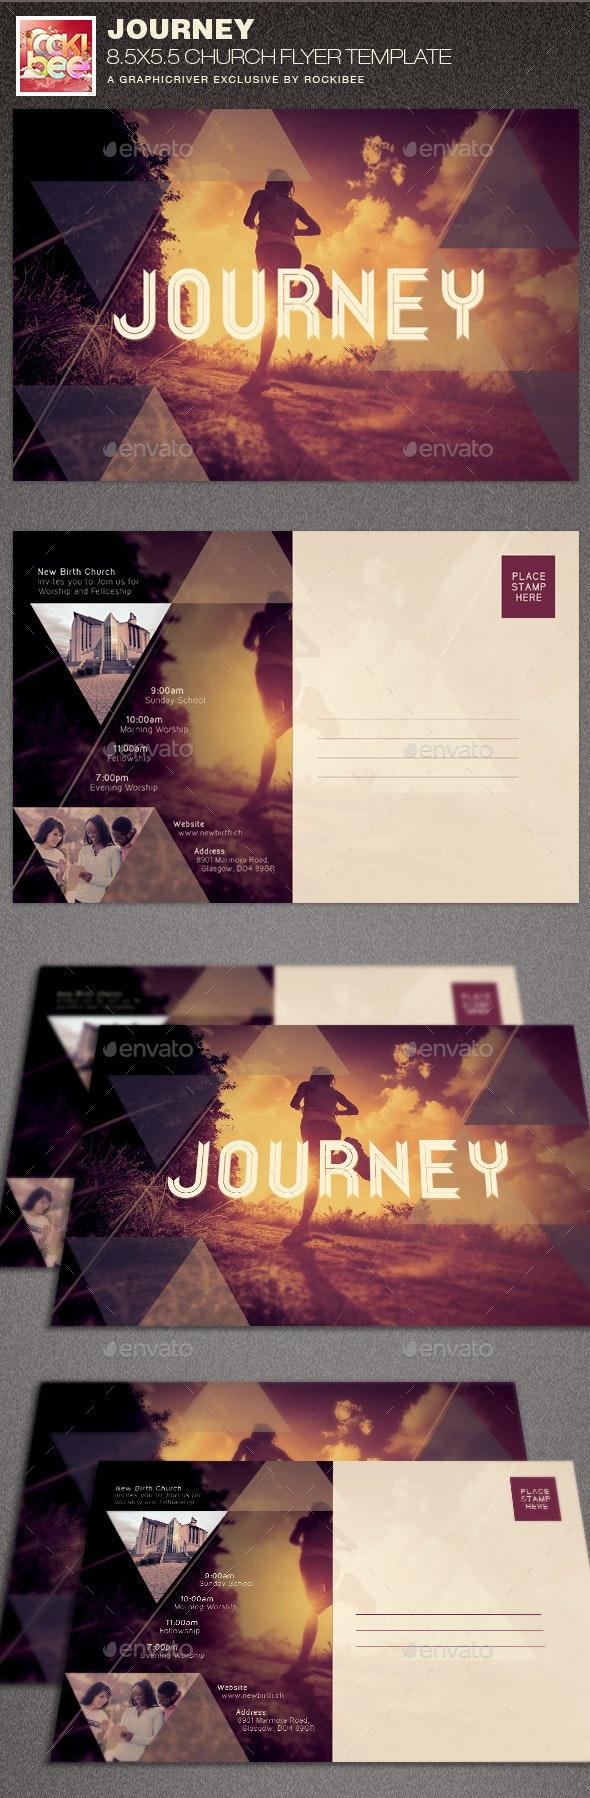 Journey Church Flyer Template - Church Flyers